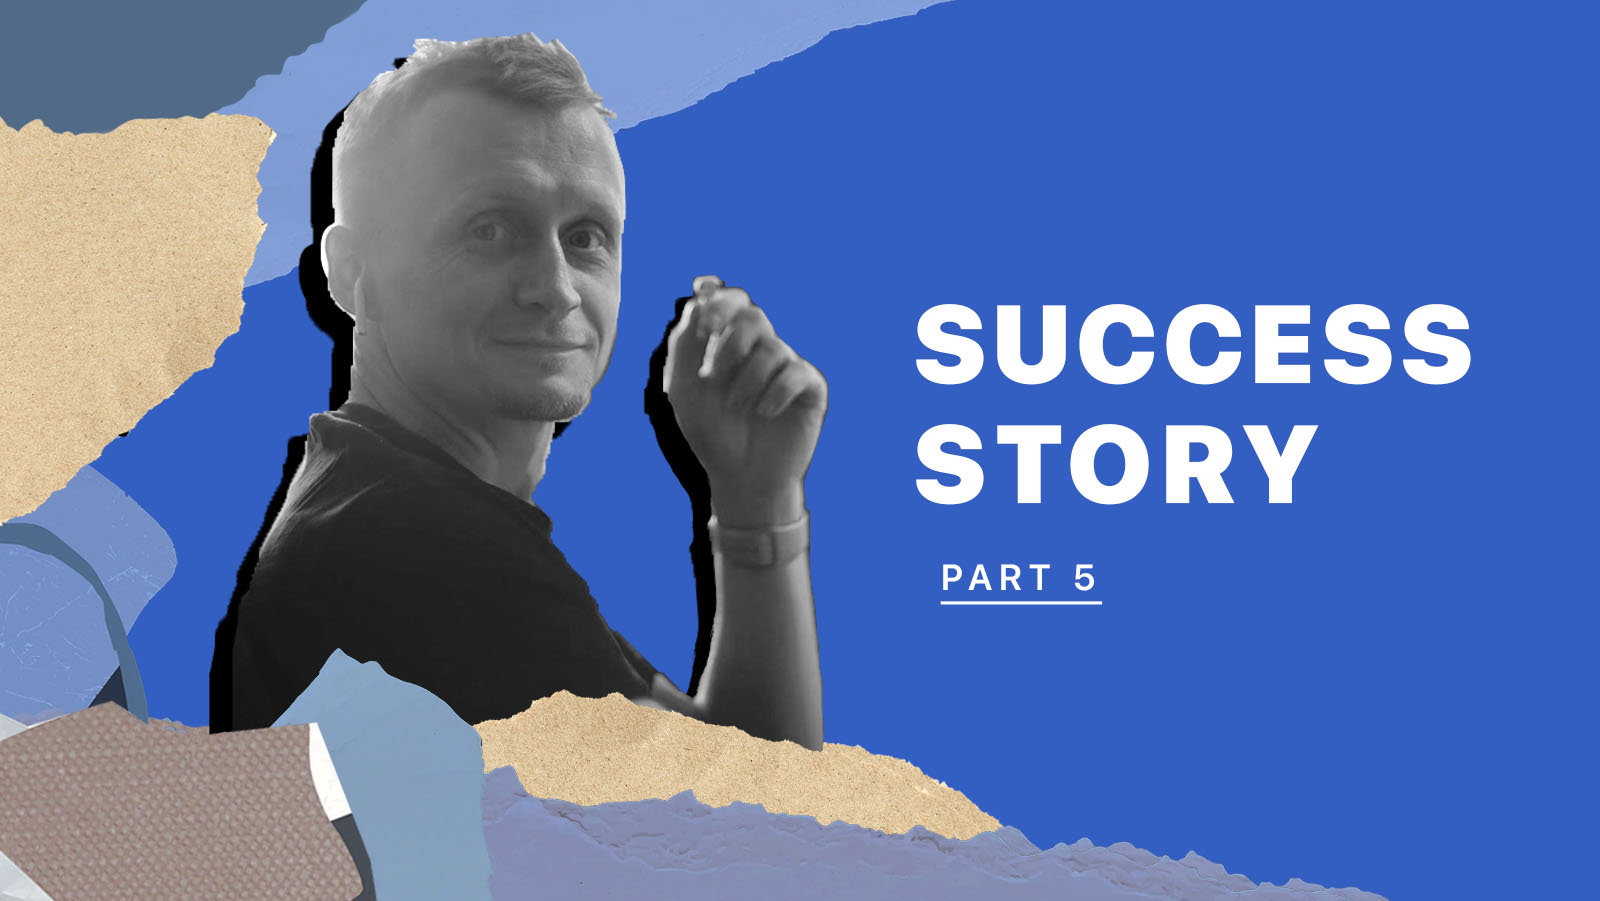 Vadim's success story